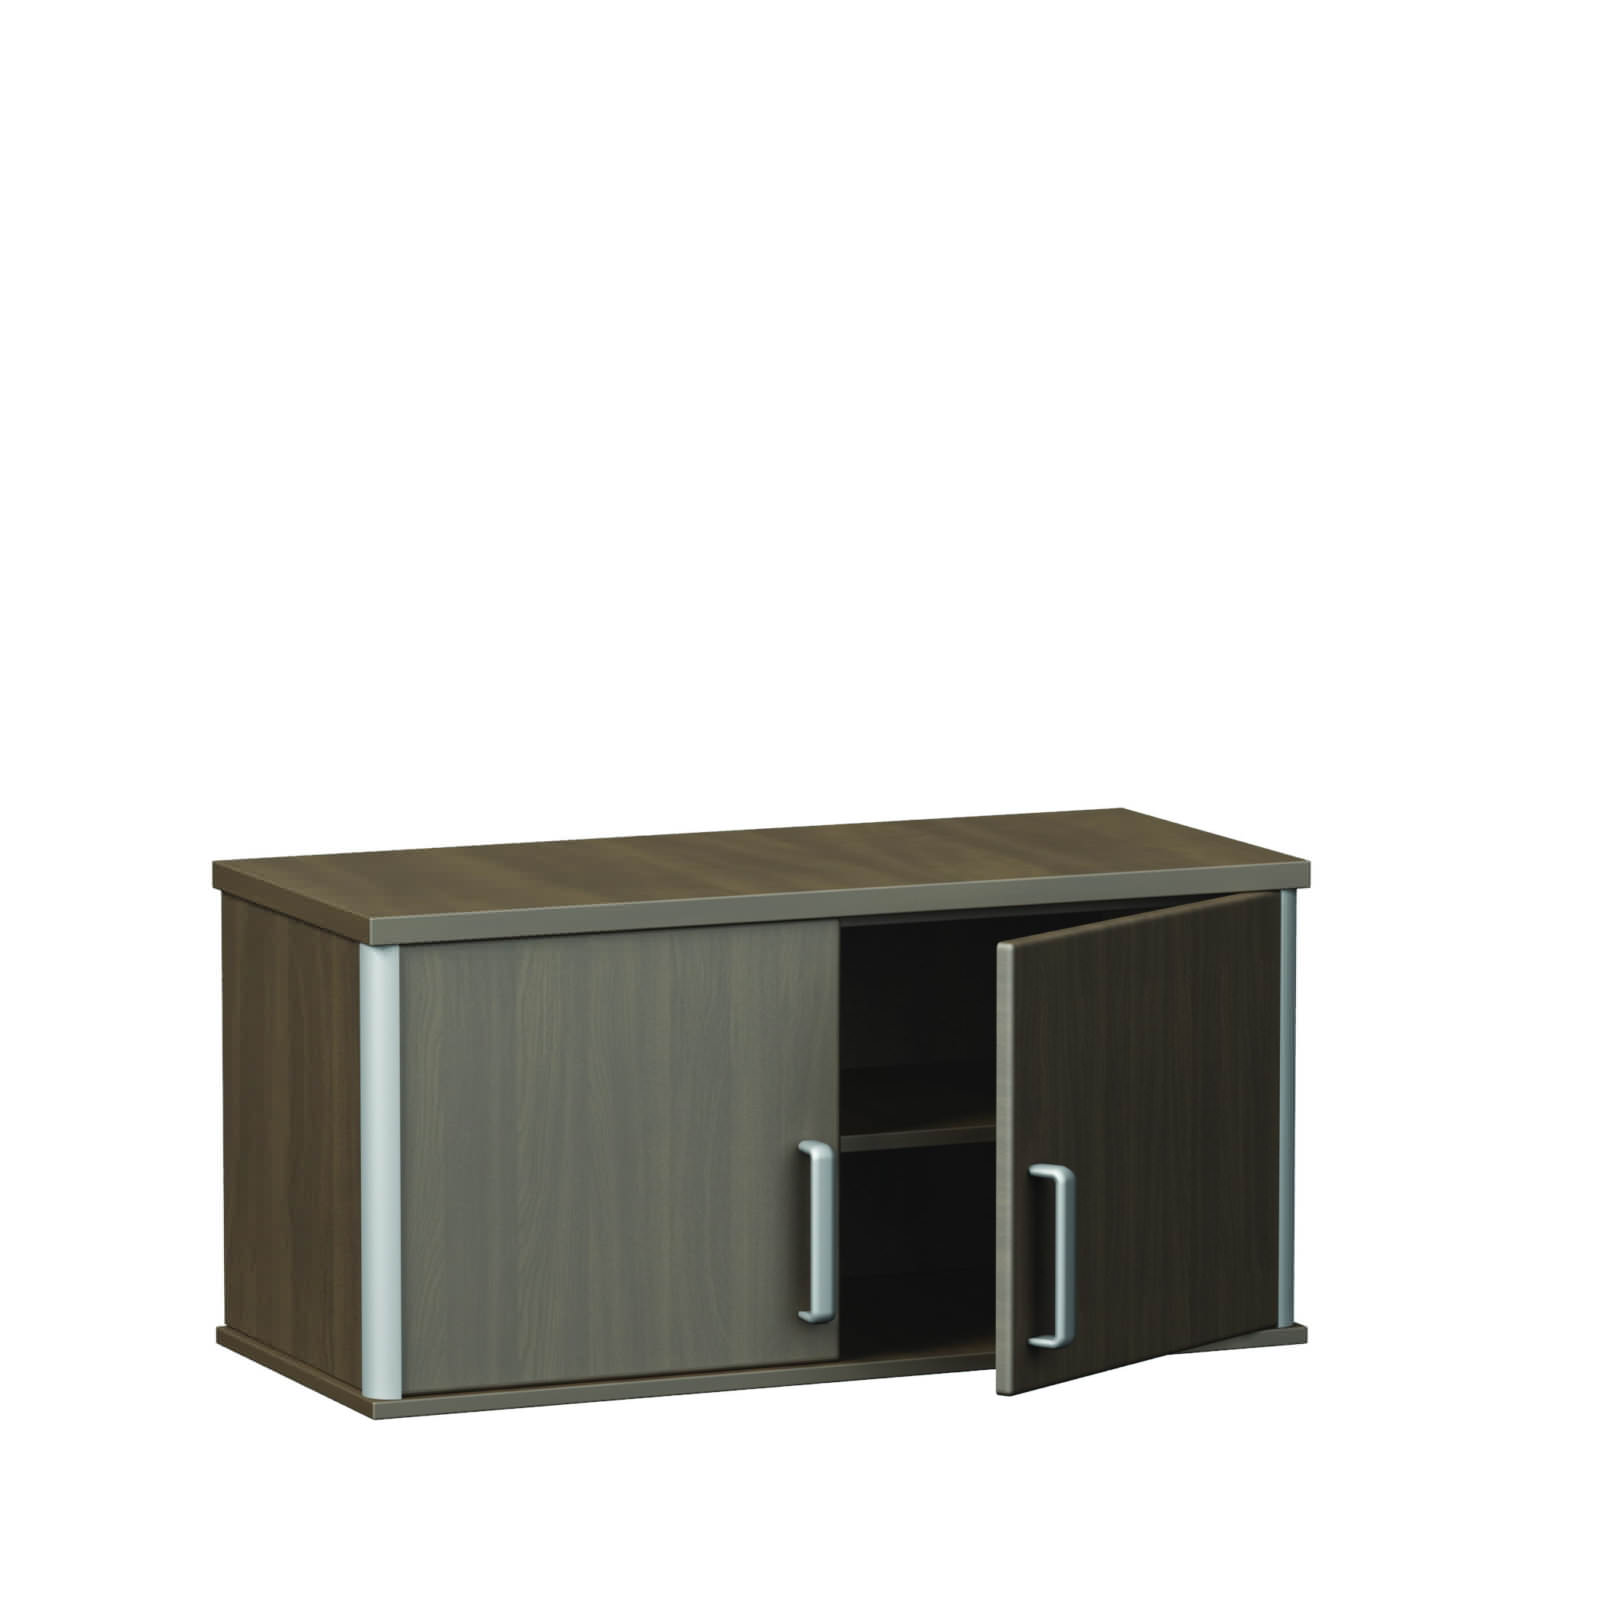 Шкаф навесной ДМ-3-002-04